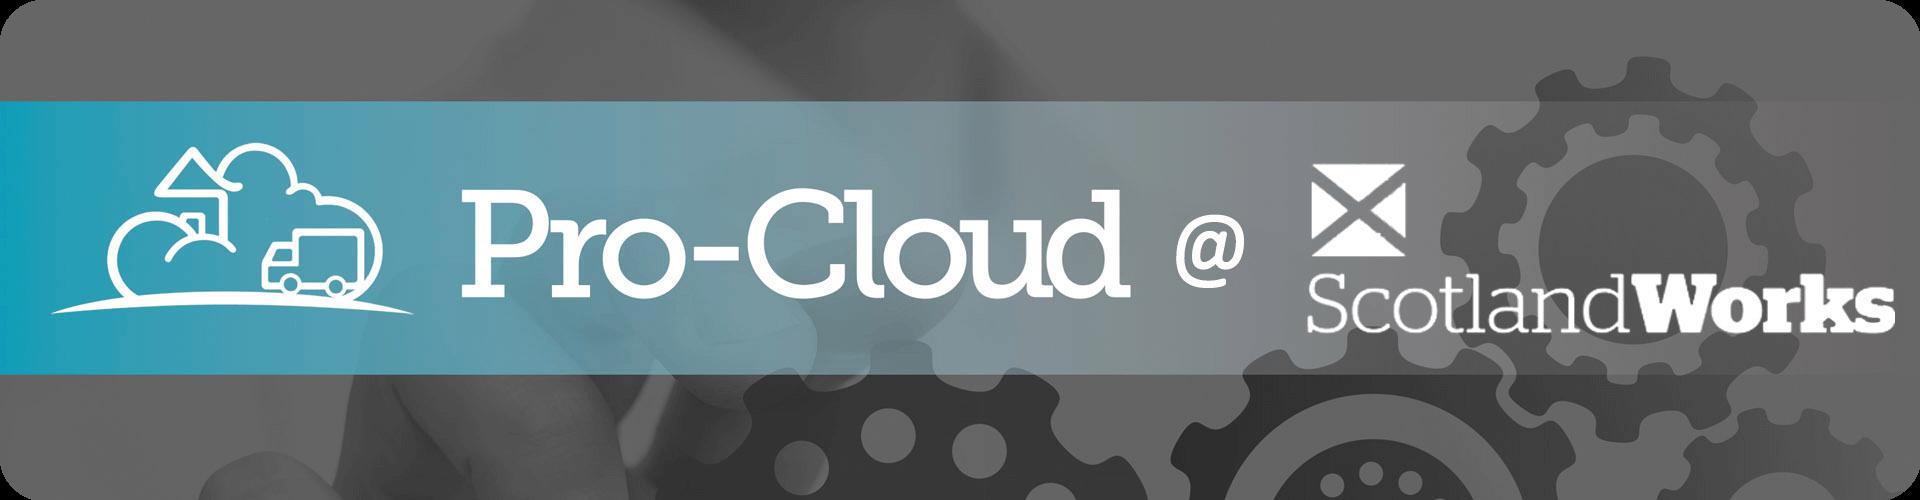 pro-cloud logo and scotland works logo